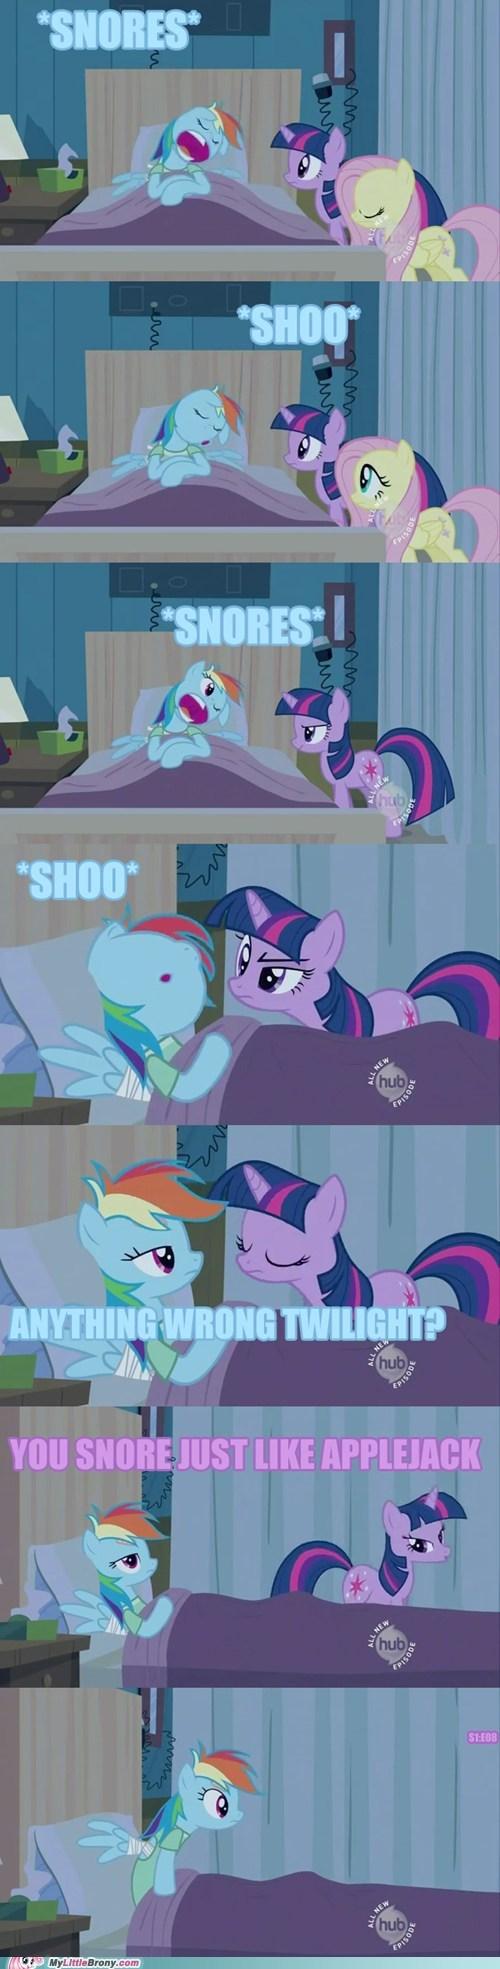 applejack comic comics rainbow dash snore voice actor - 5790688256